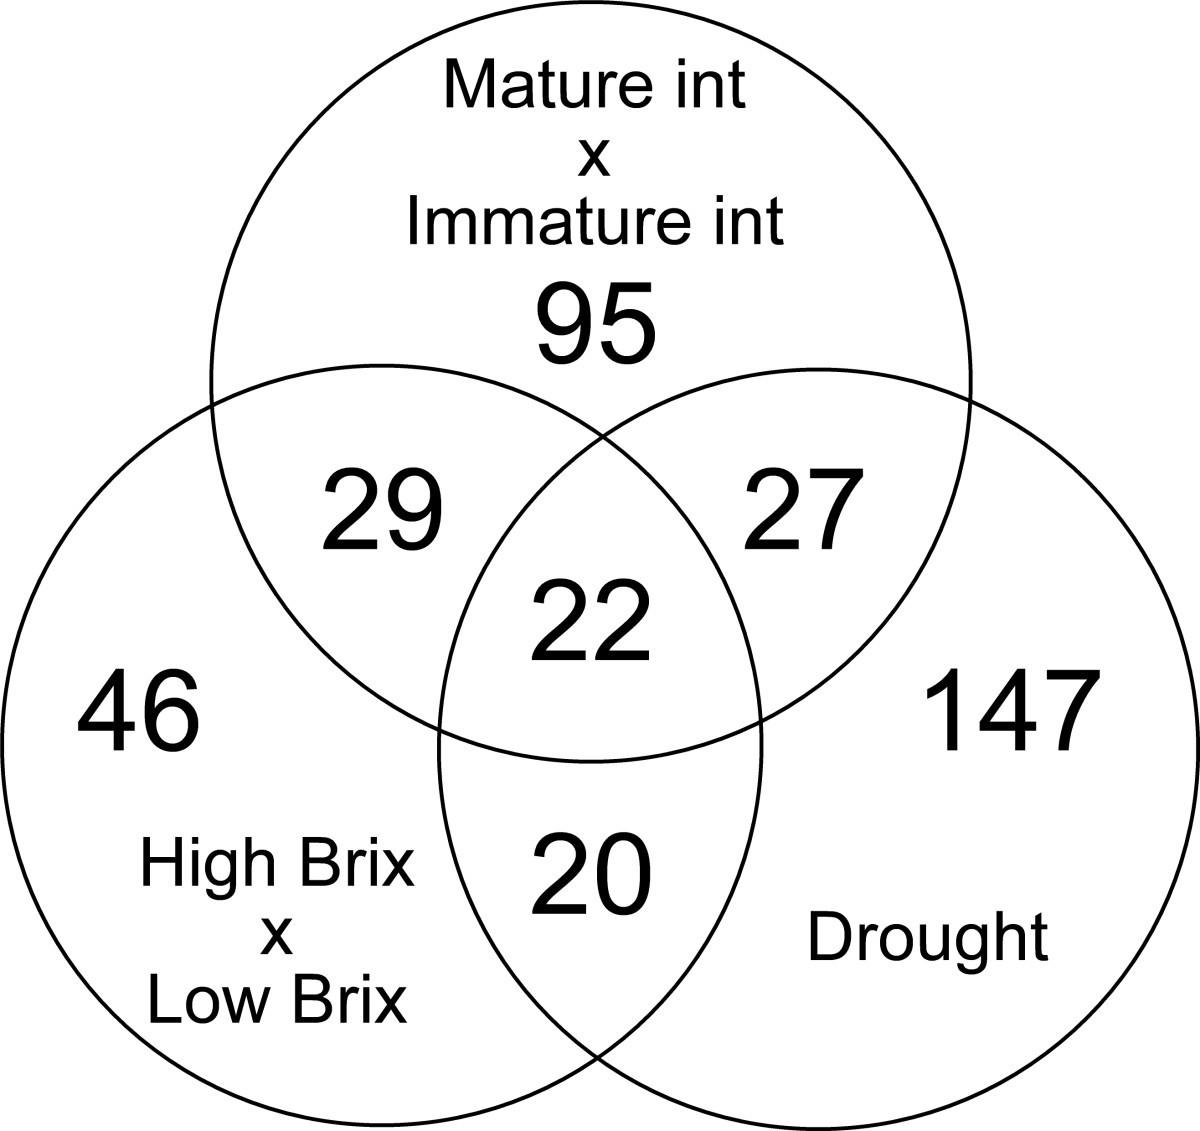 Sugarcane Genes Associated With Sucrose Content Bmc Genomics Sp Reguler Axis Hitz Figure 1